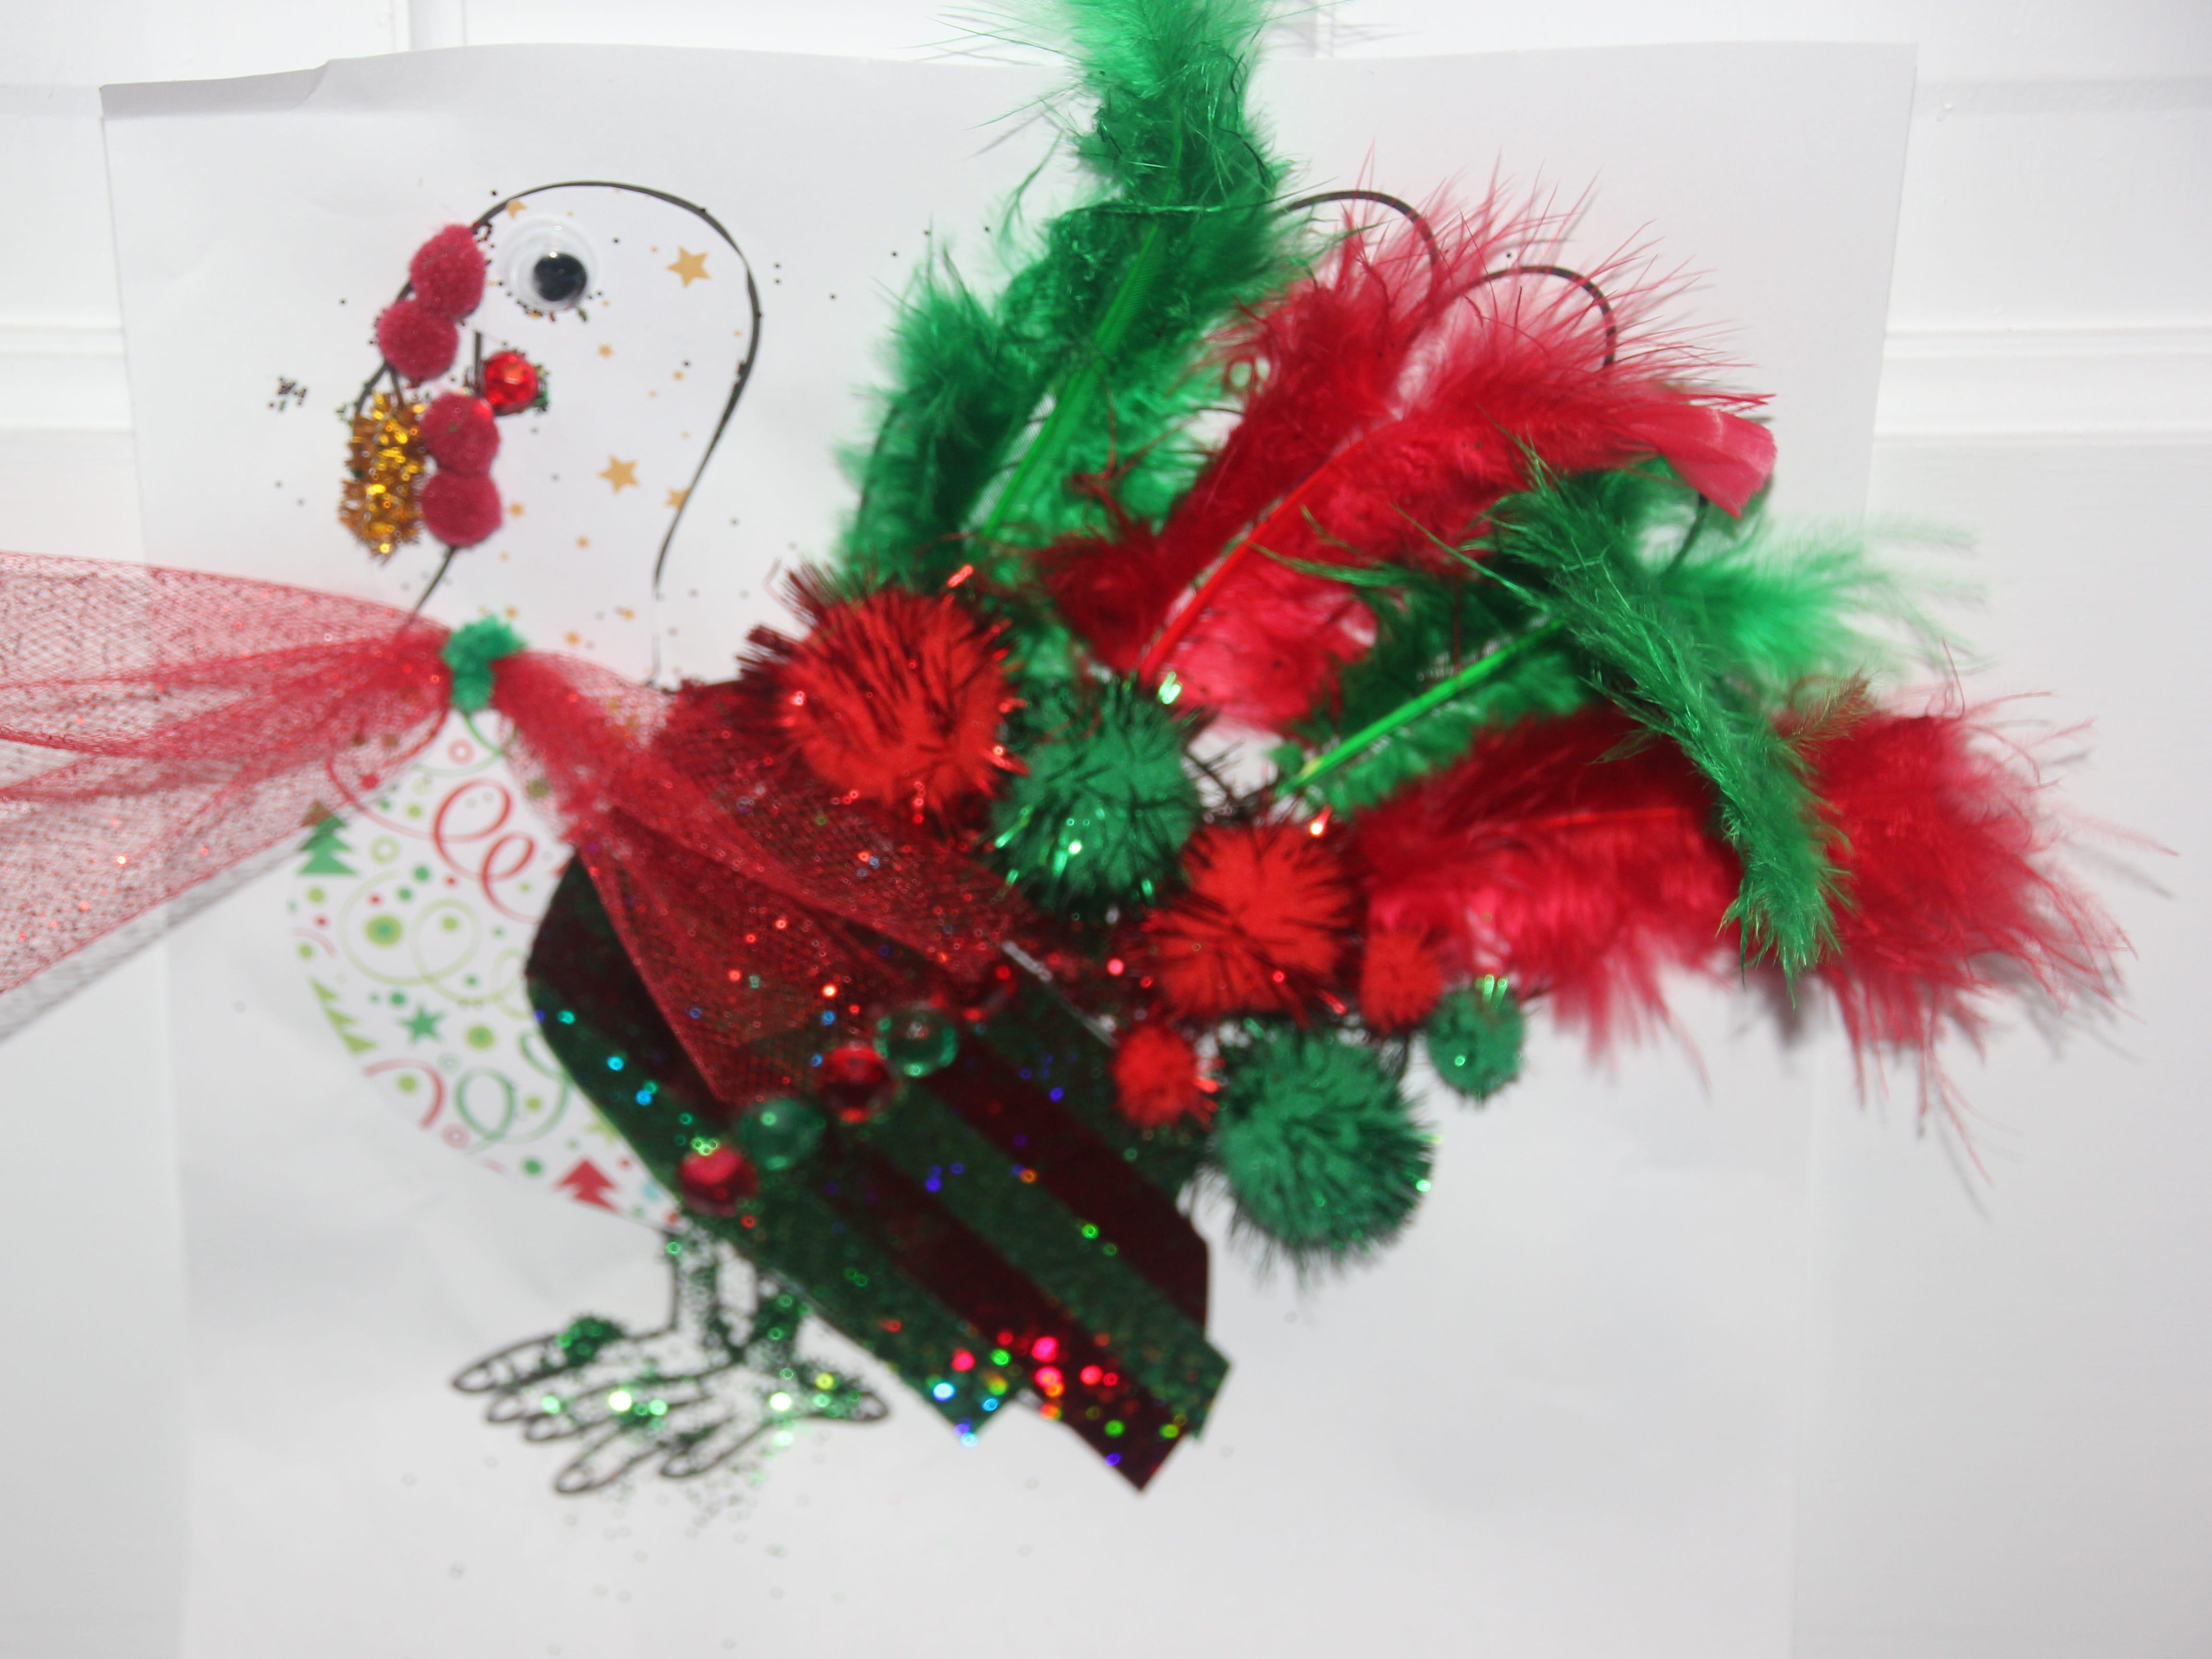 K. Pressler. Dress the Turkey Contest 2018.